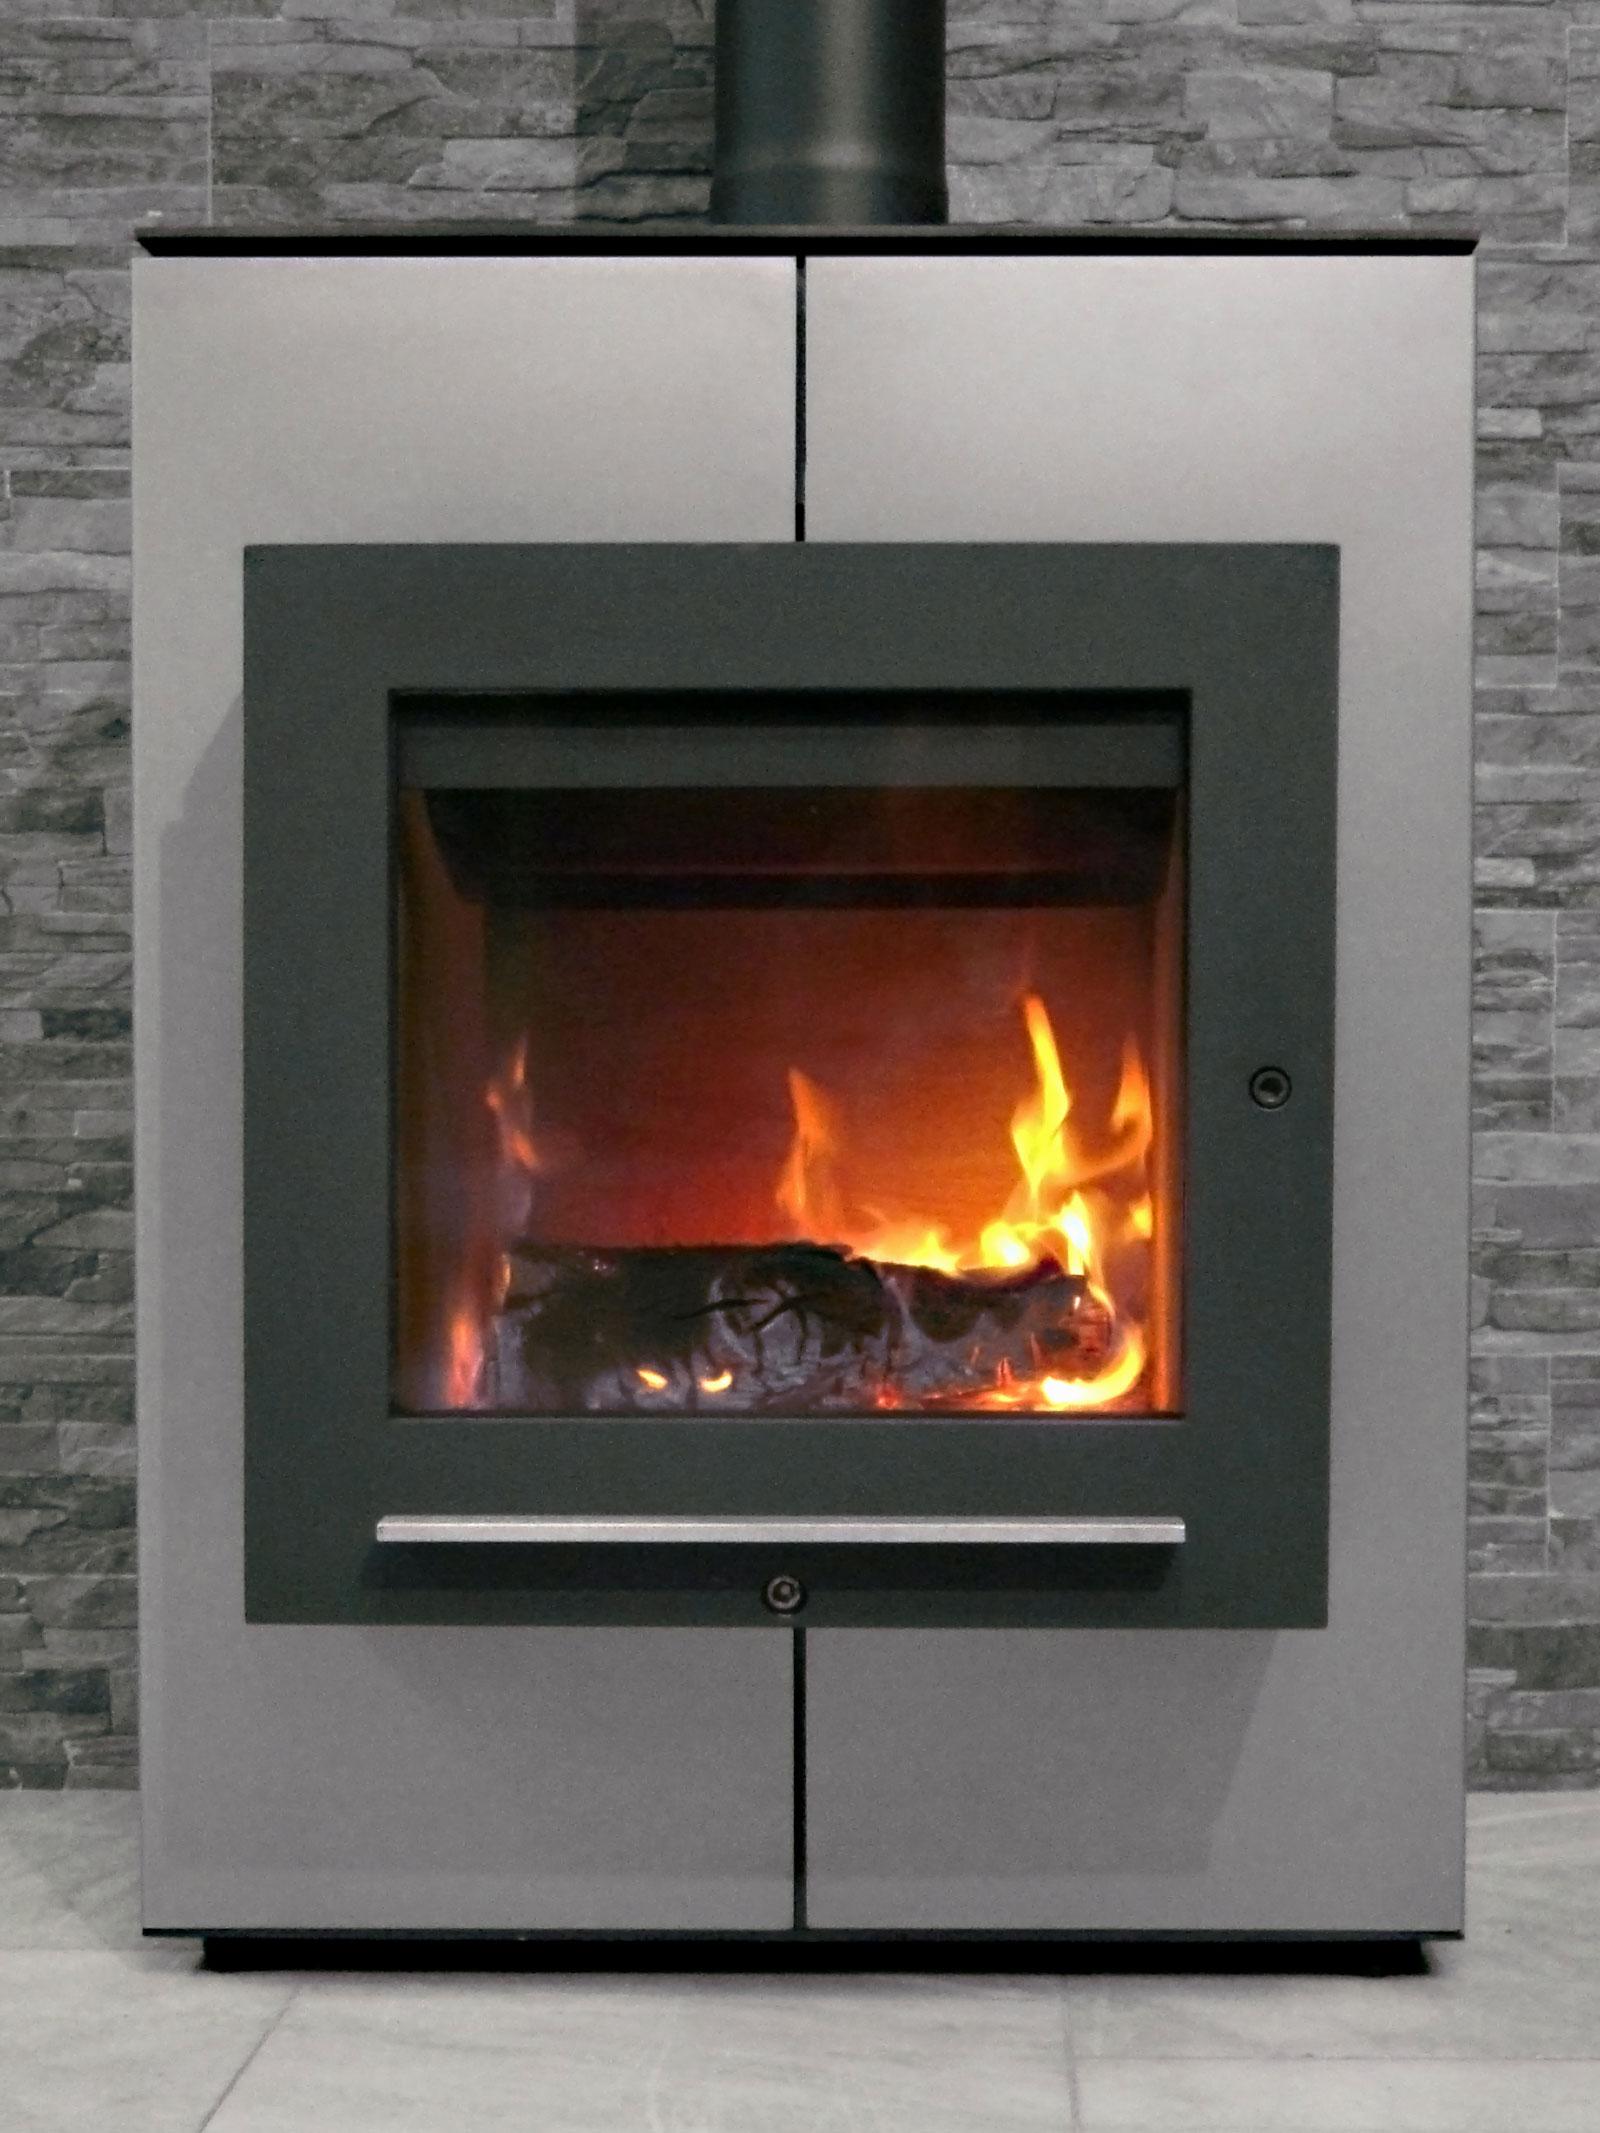 masavukmanovic.com - firecube fireplace 02